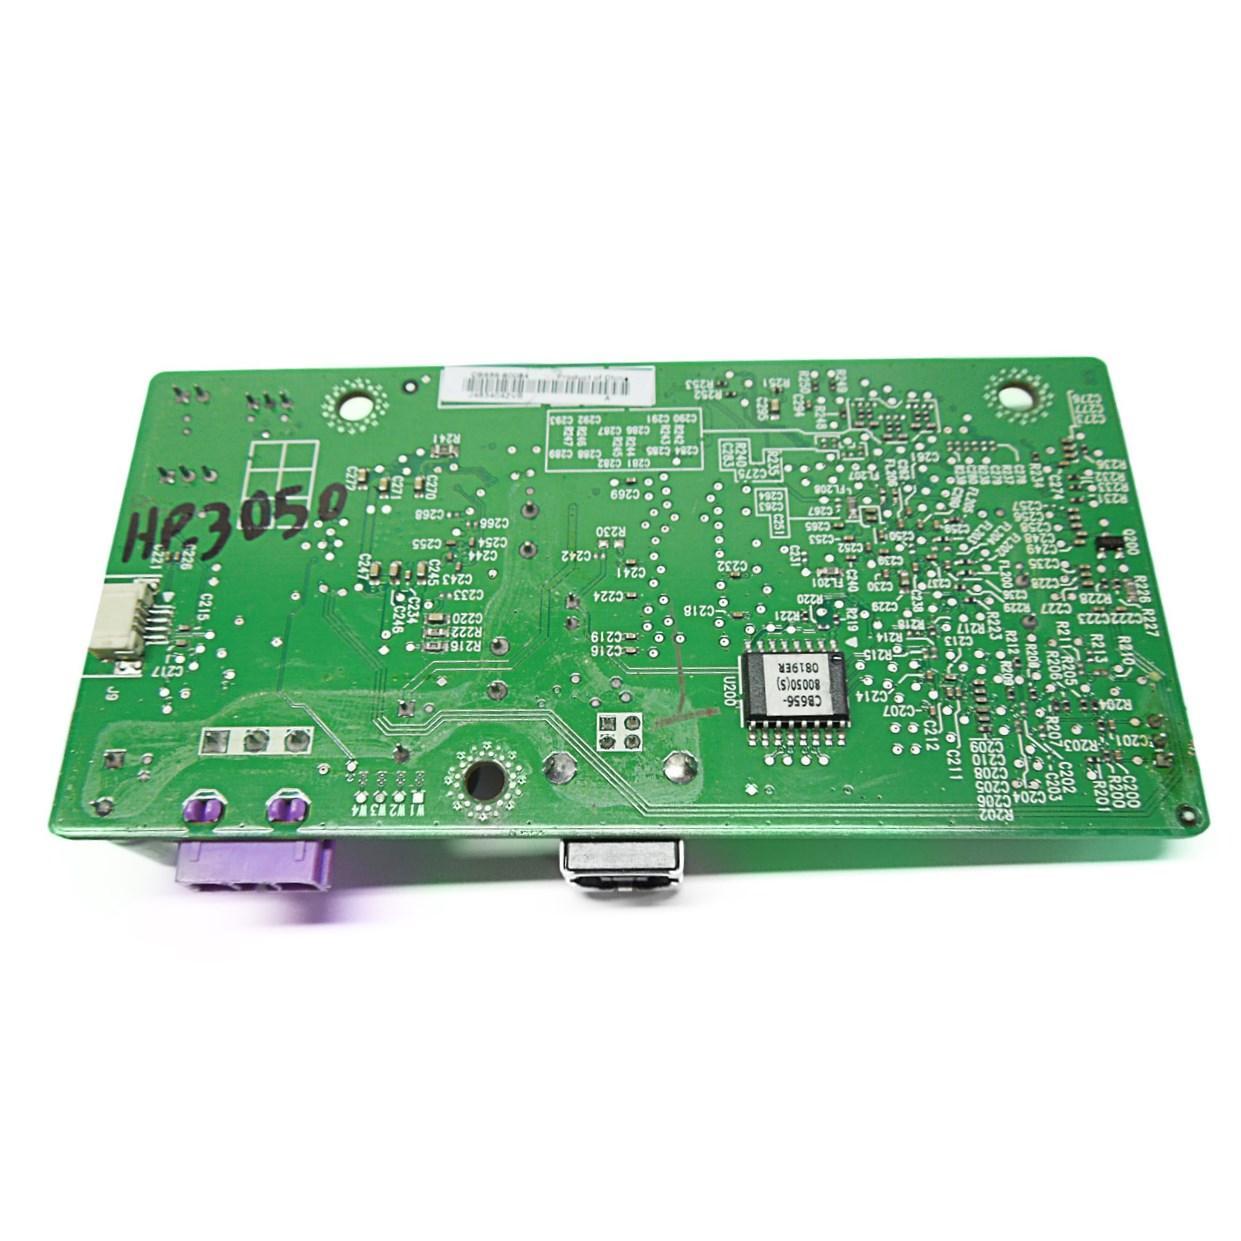 Placa Lógica da Multifuncional HP F4280 - CB656-80002